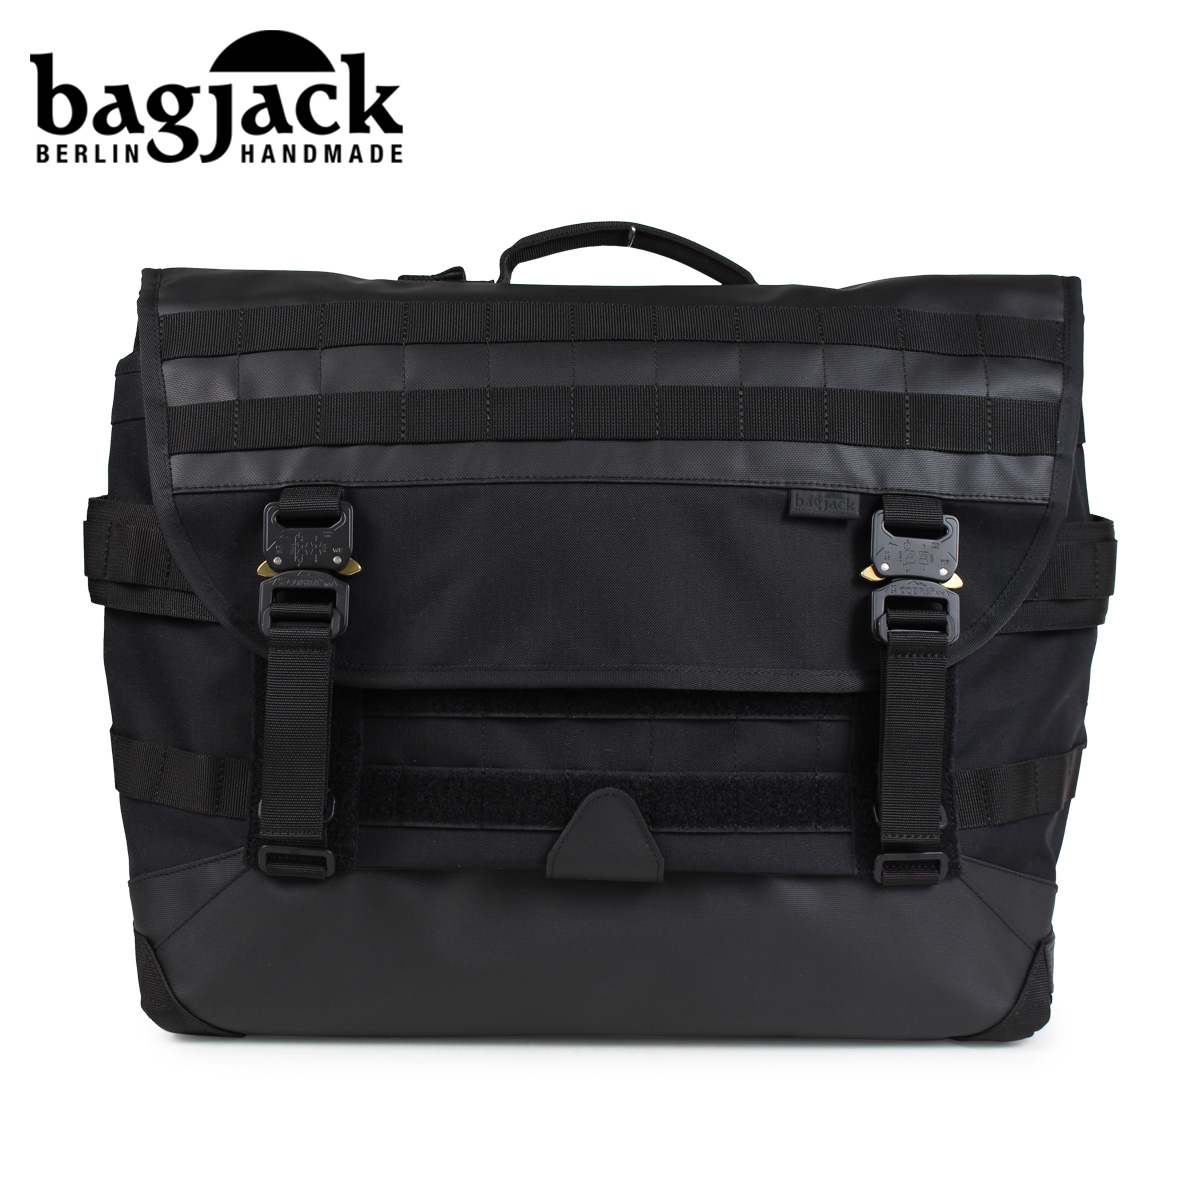 bagjack NEXT LEVEL MESSENGER M TECH LINE バッグジャック メッセンジャーバッグ ショルダーバッグ メンズ レディース ブラック